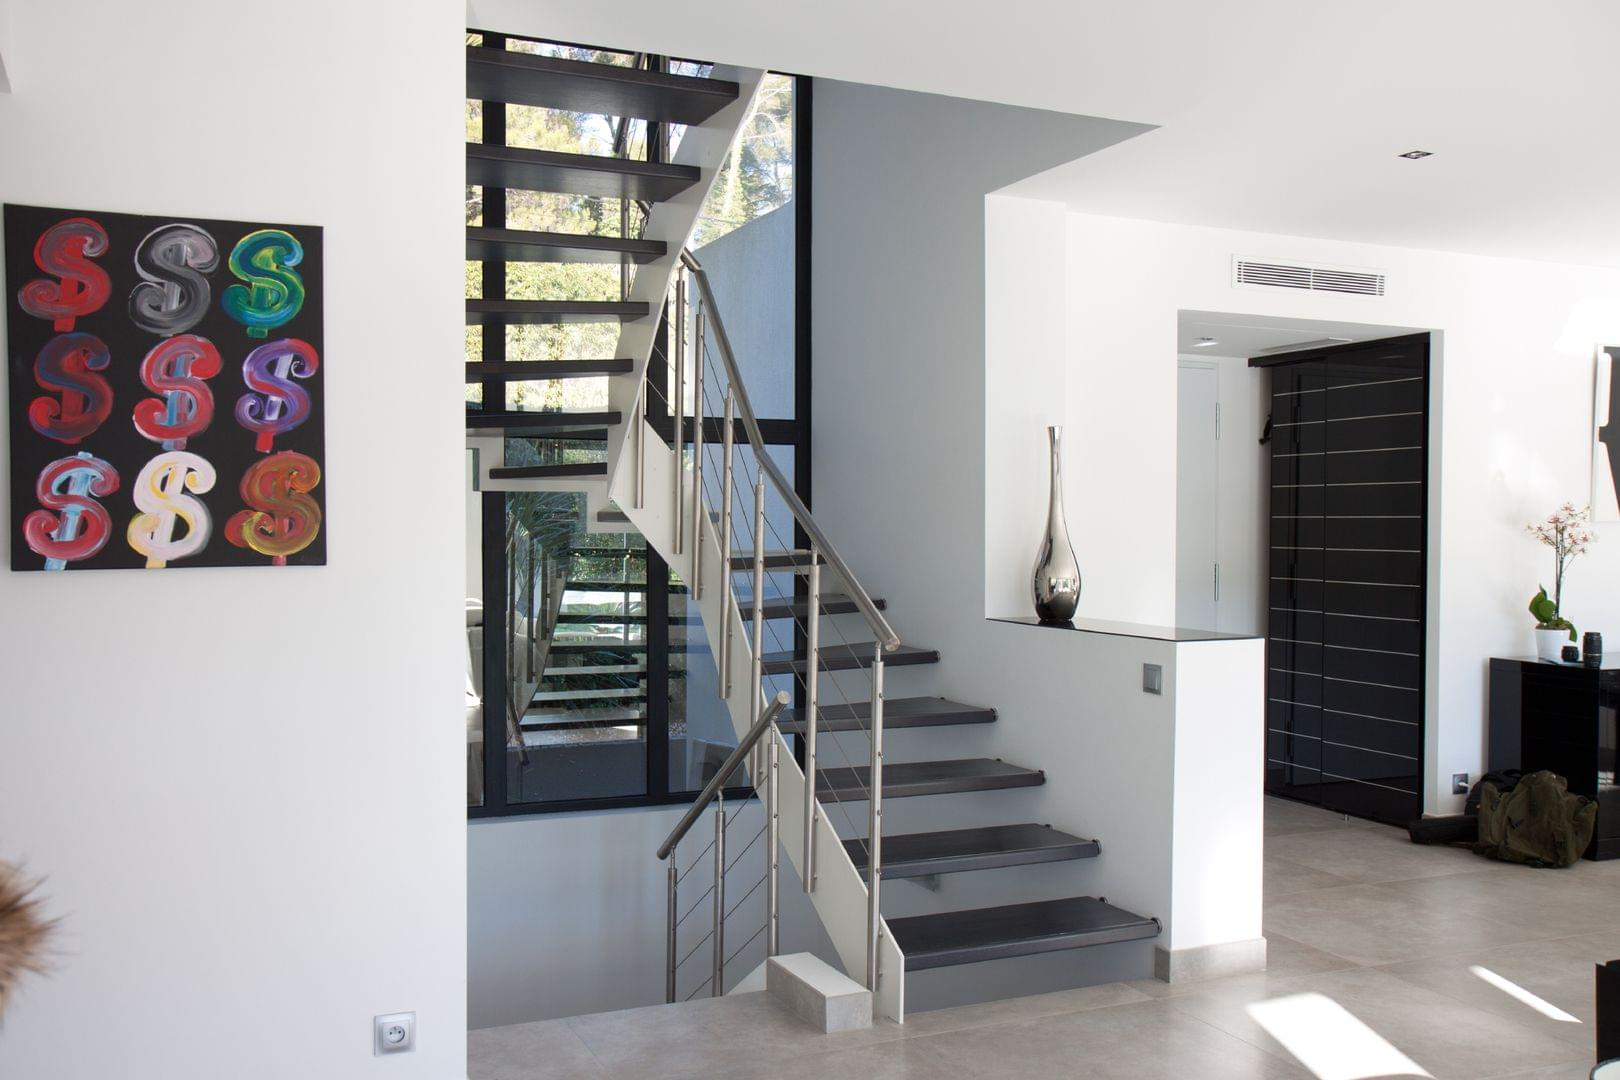 stahltreppen stahlwangentreppen und holz stahltreppen von treppenmeister. Black Bedroom Furniture Sets. Home Design Ideas